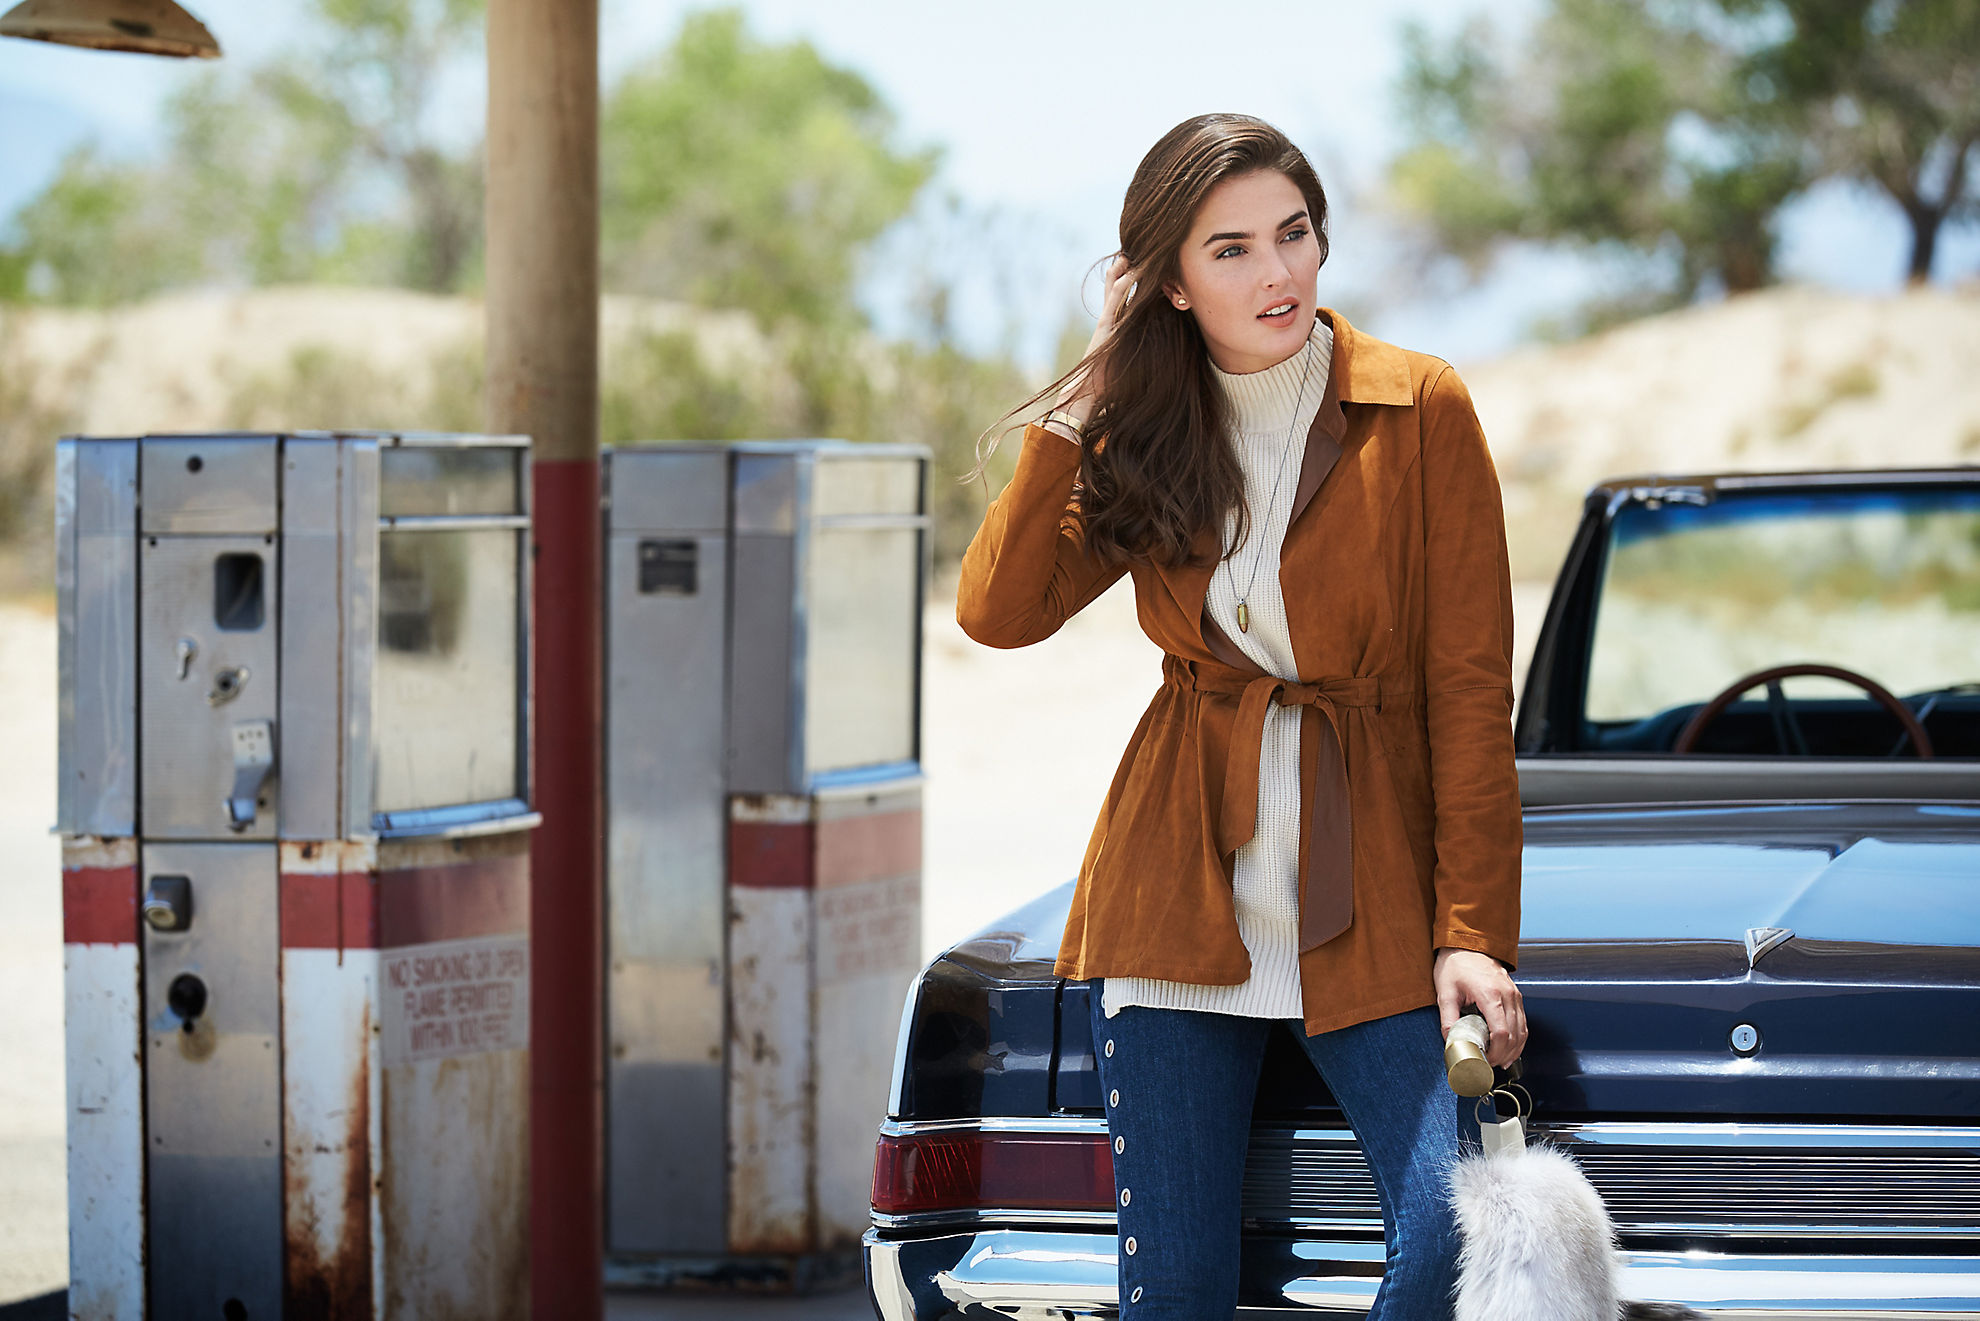 Vera Reversible Goatskin Suede Leather Jacket